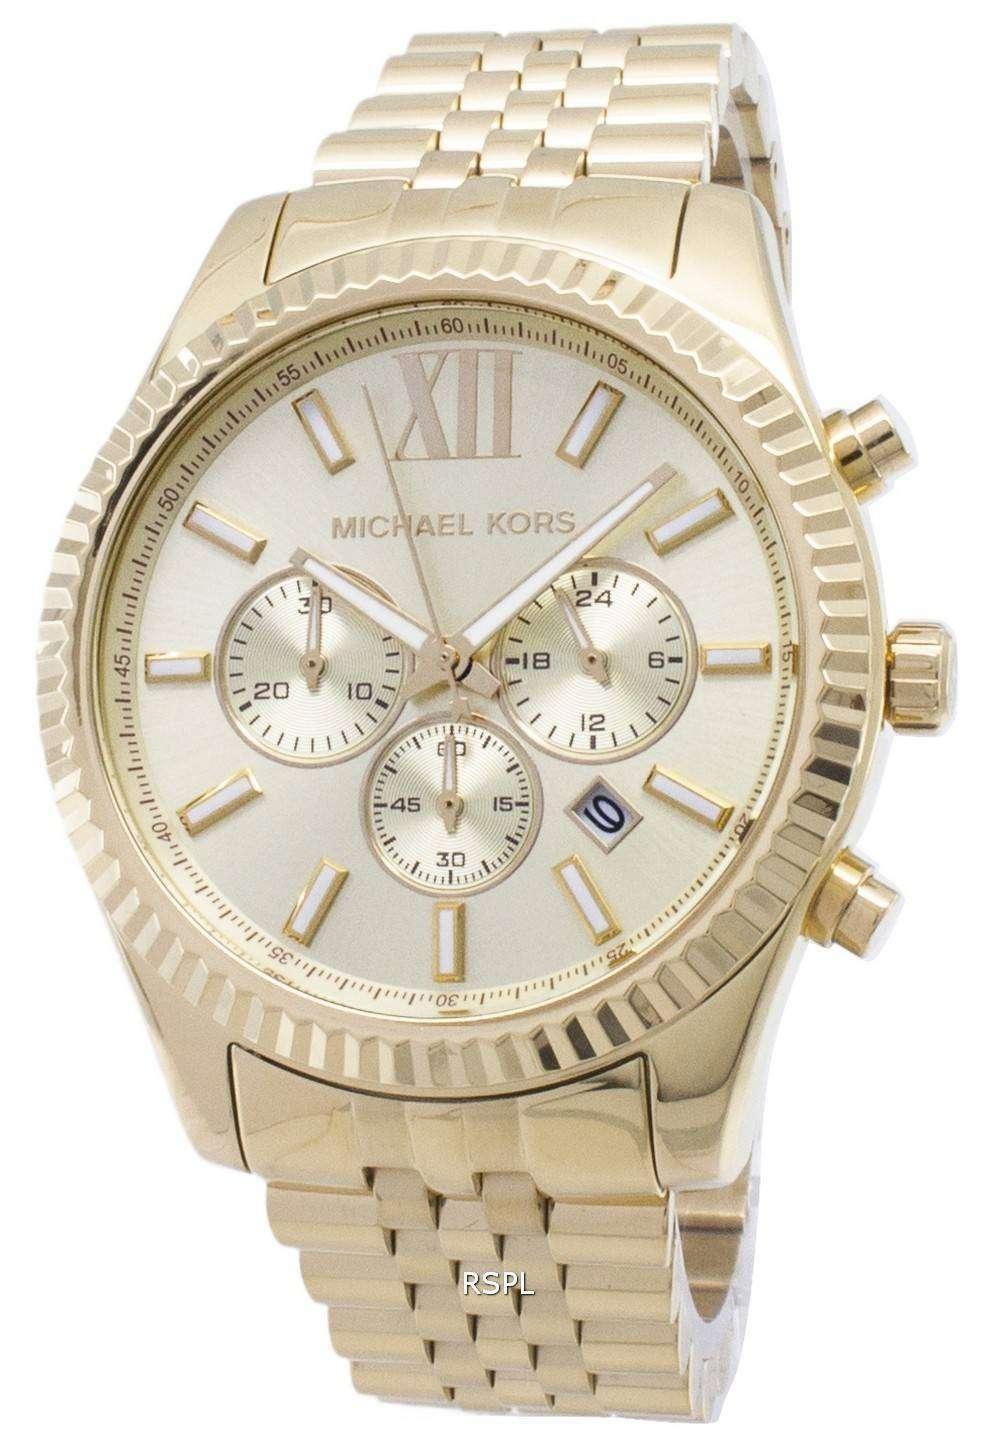 5e1a36760684 Michael Kors Lexington Chronograph Champagne Dial MK8281 Mens ...